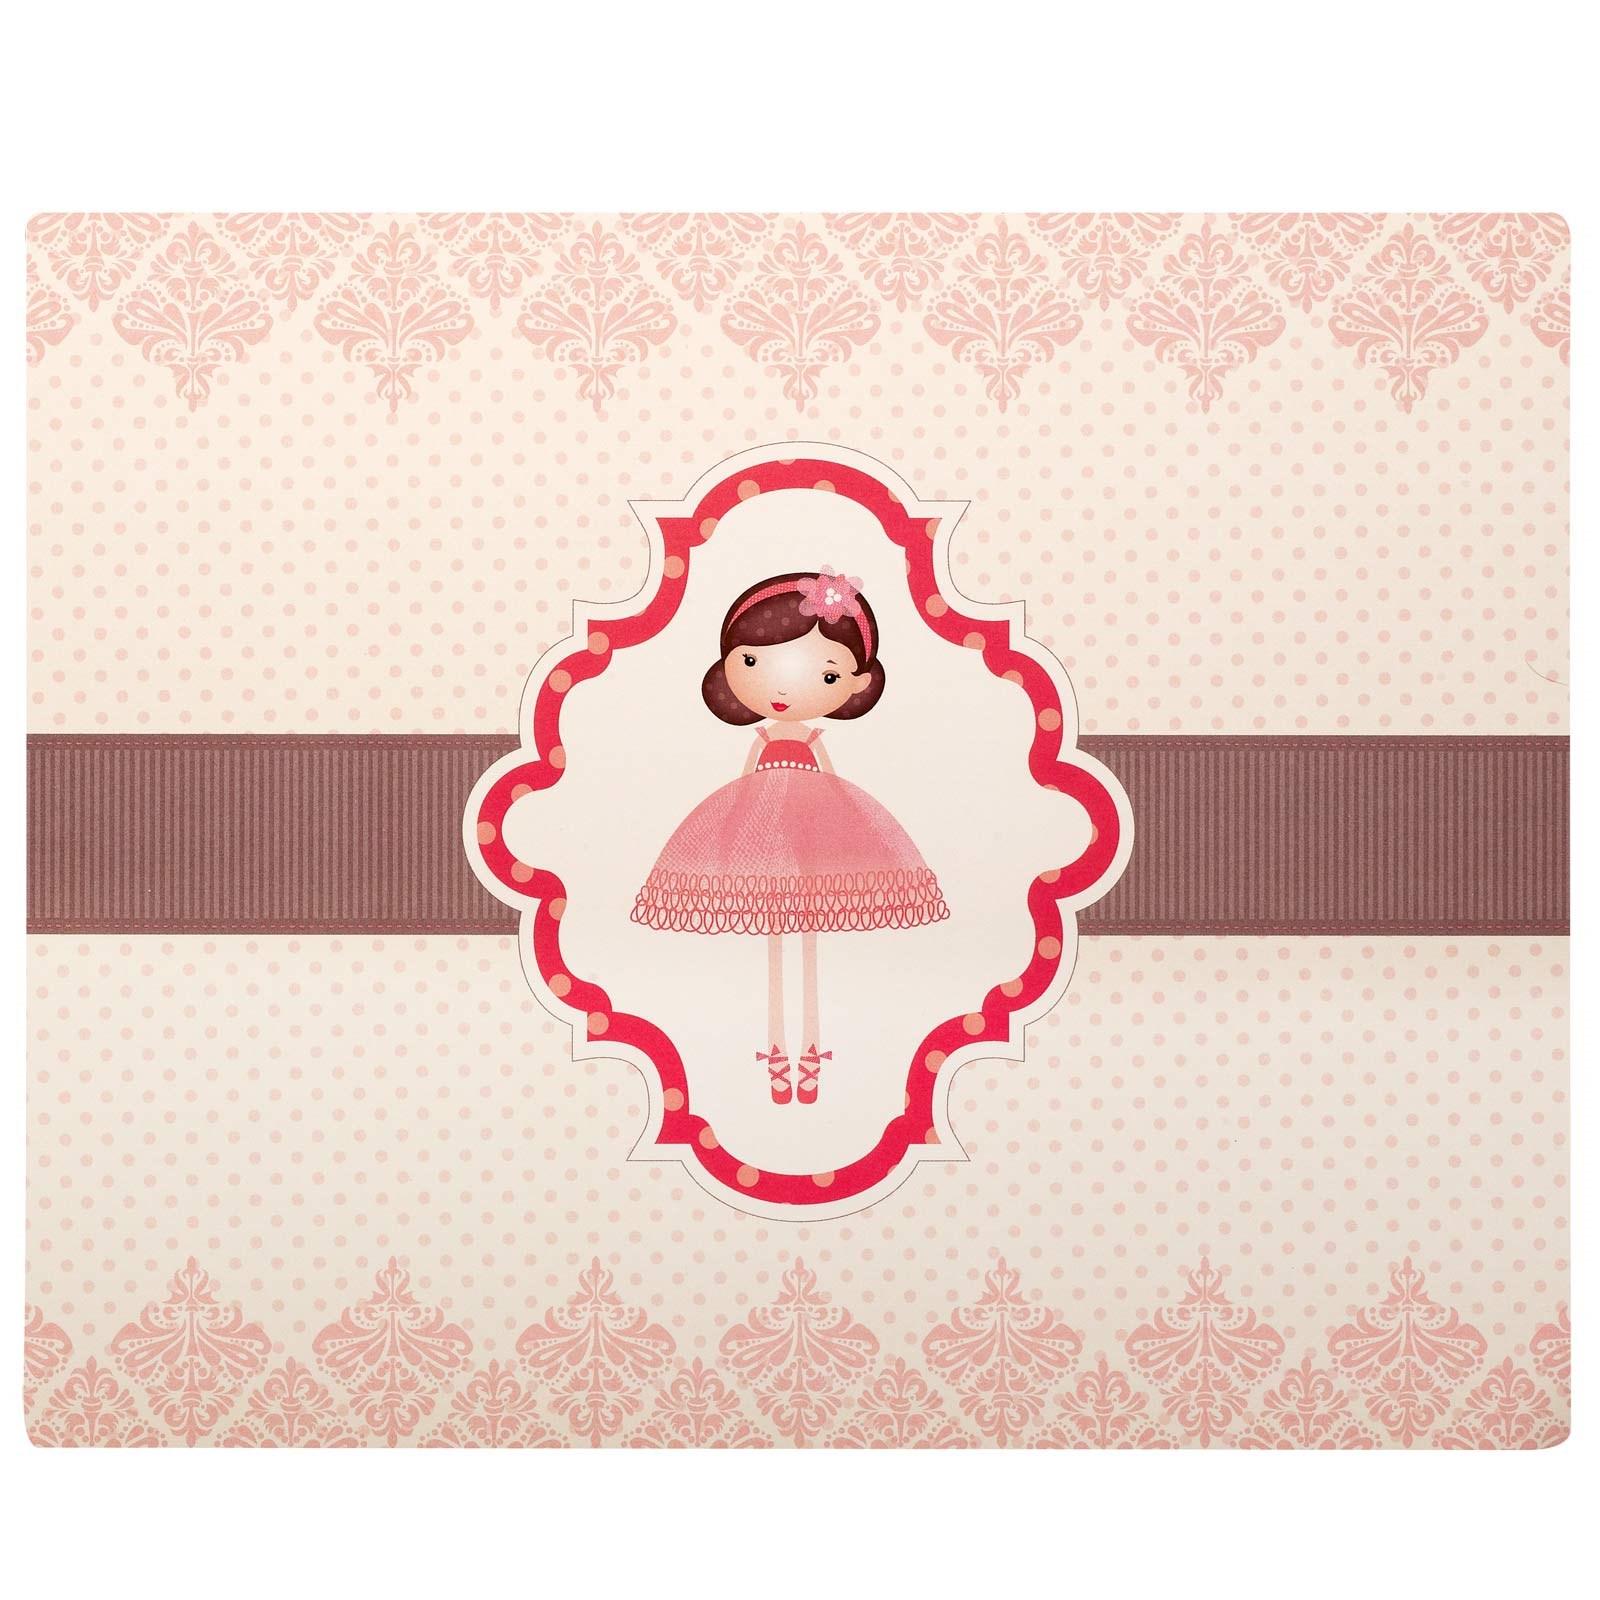 Image of Ballerina Tutu Activity Placemats